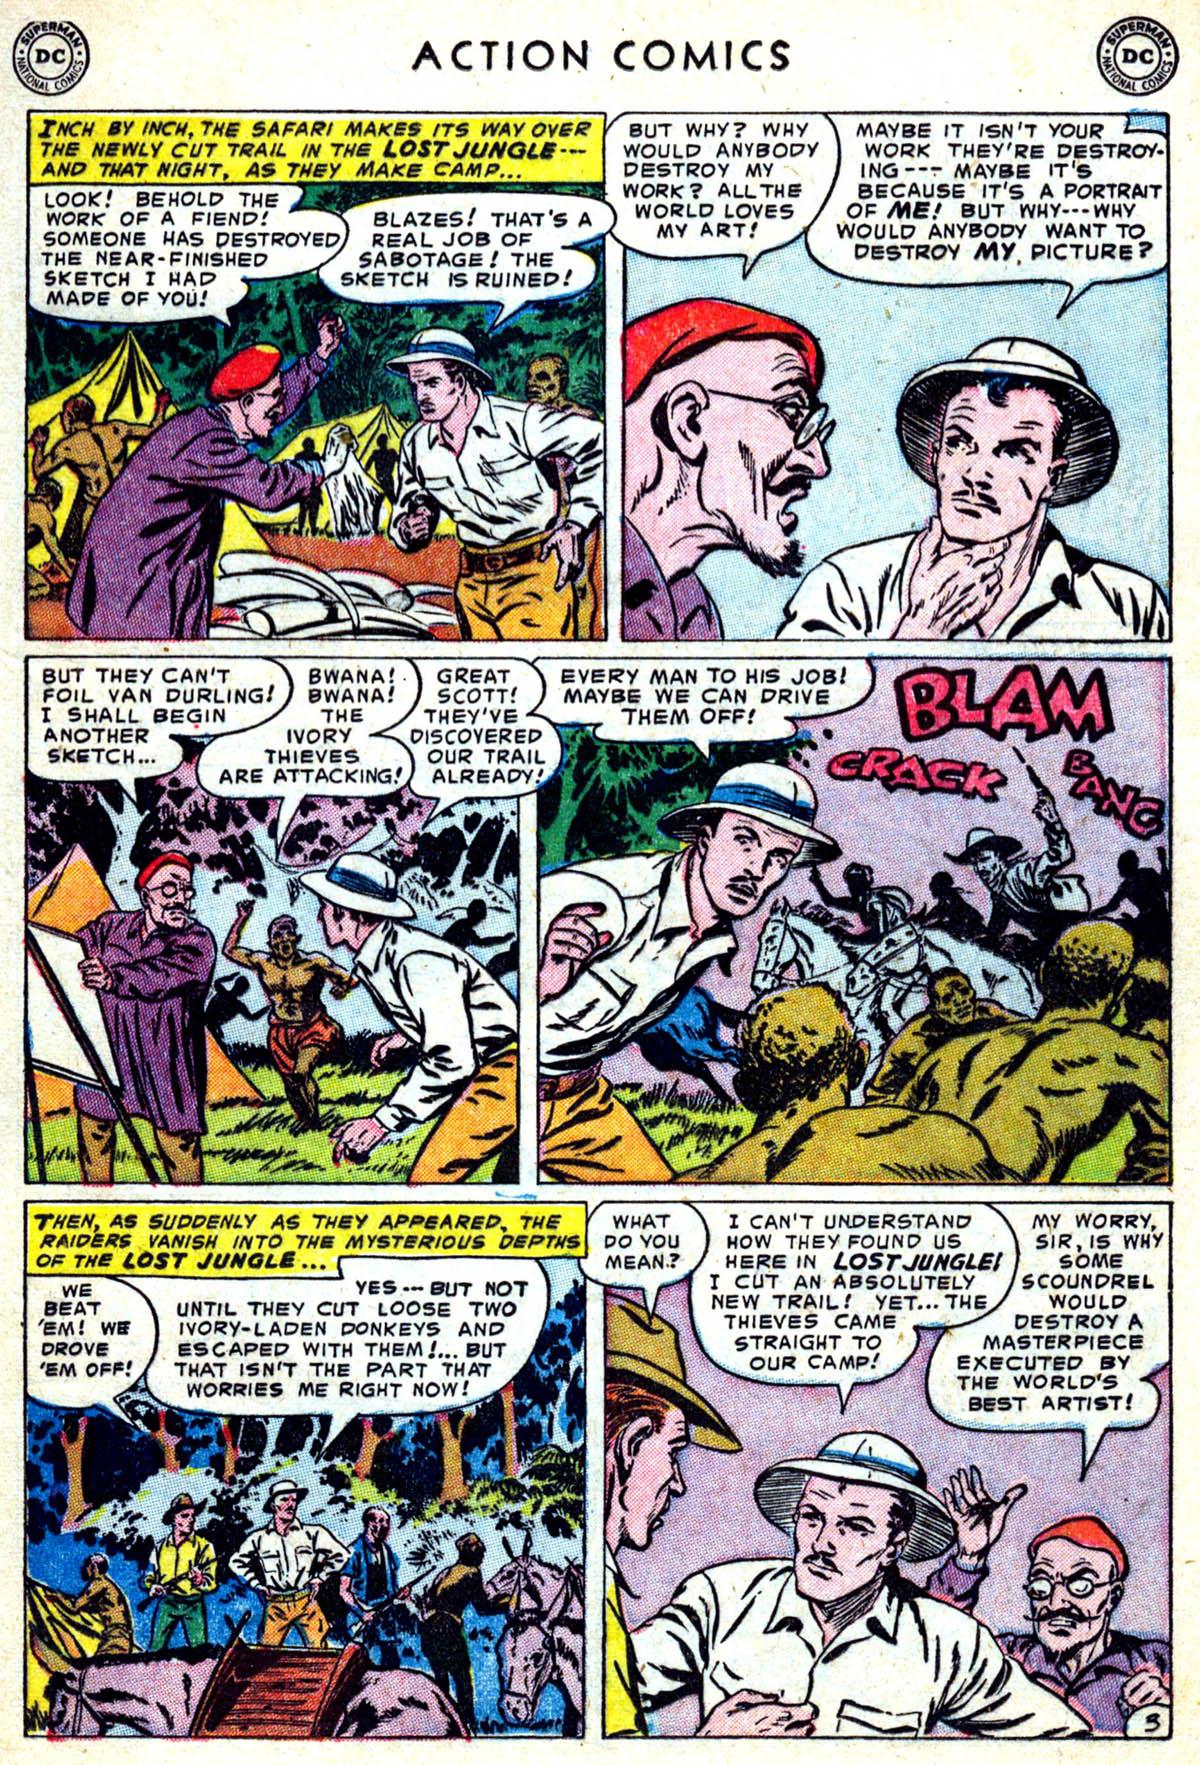 Action Comics (1938) 183 Page 18